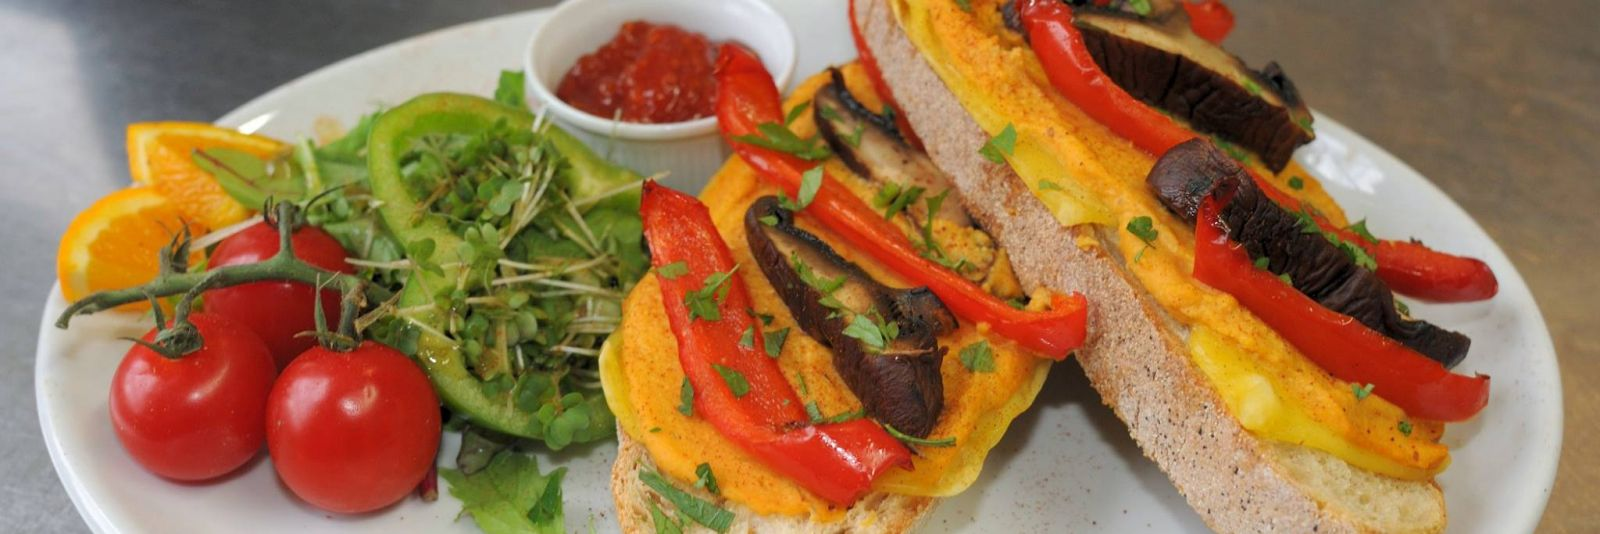 Rarebit: On the Breakfast Menu